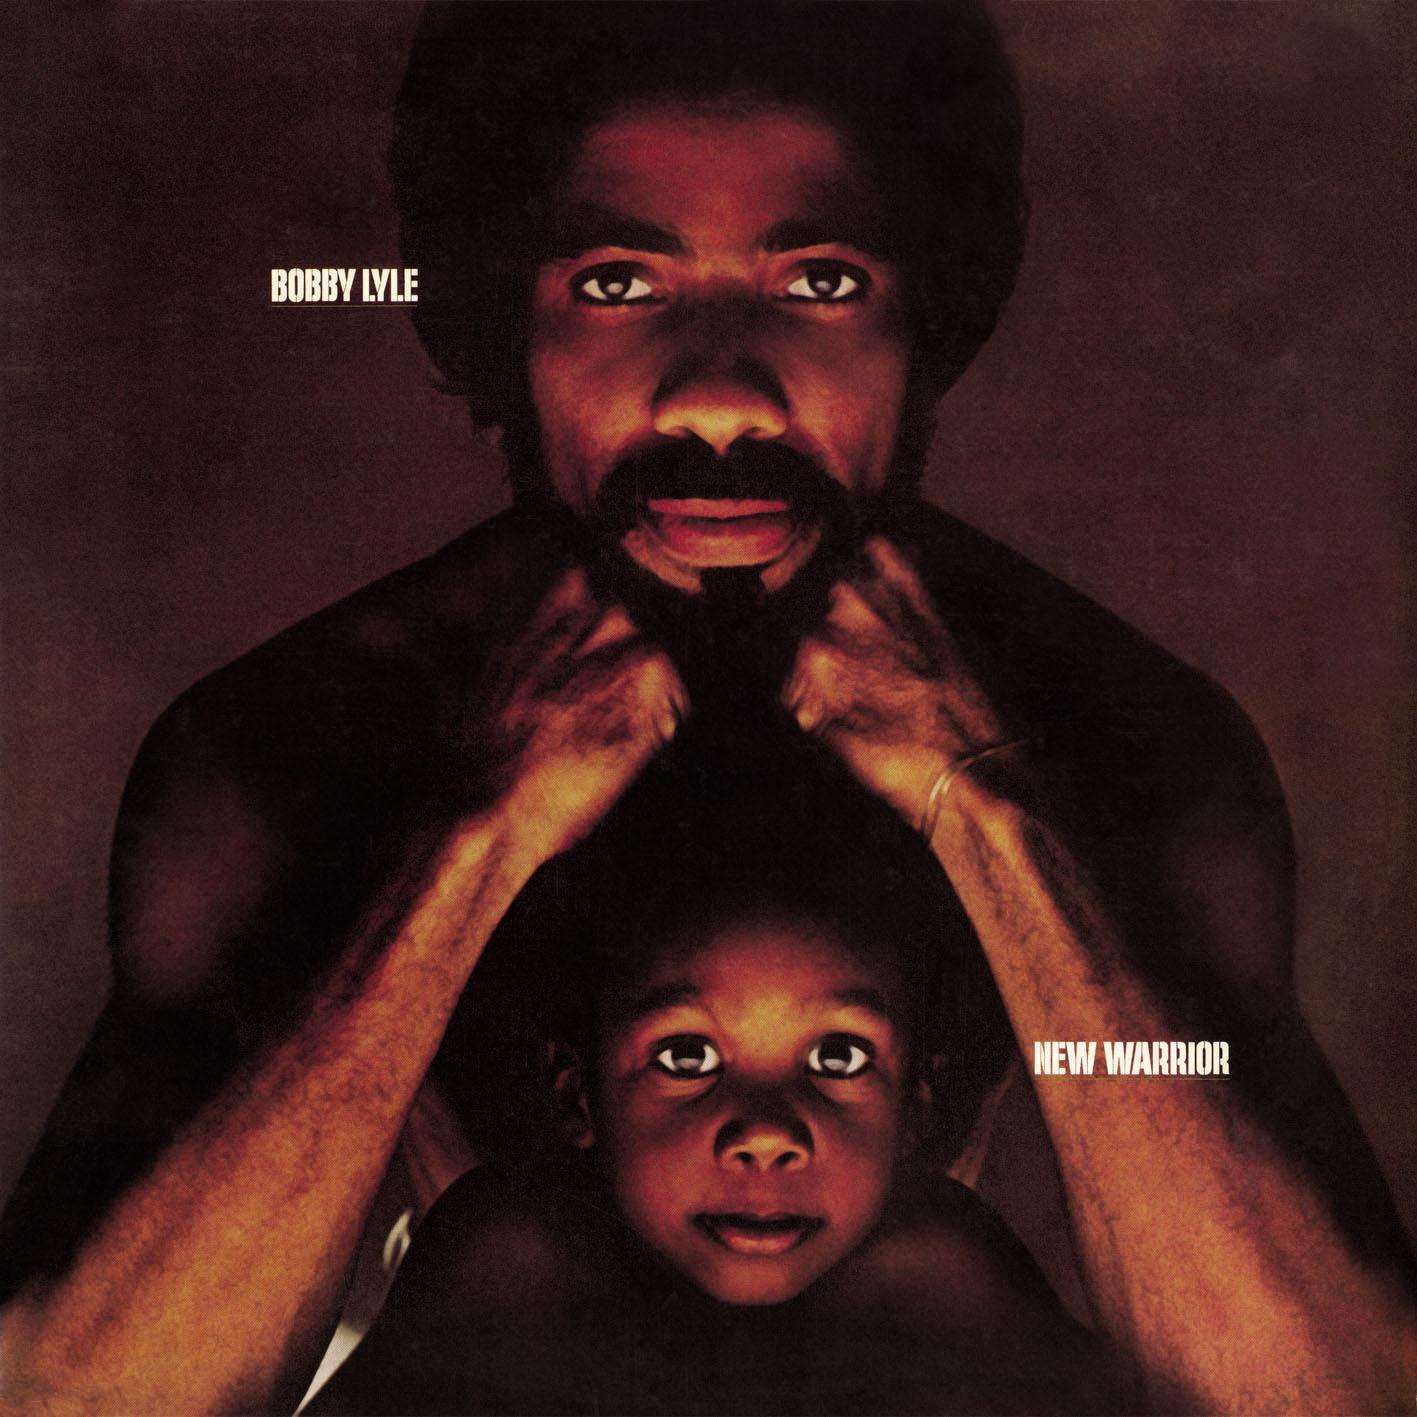 Bobby Lyle/NEW WARRIOR  CD